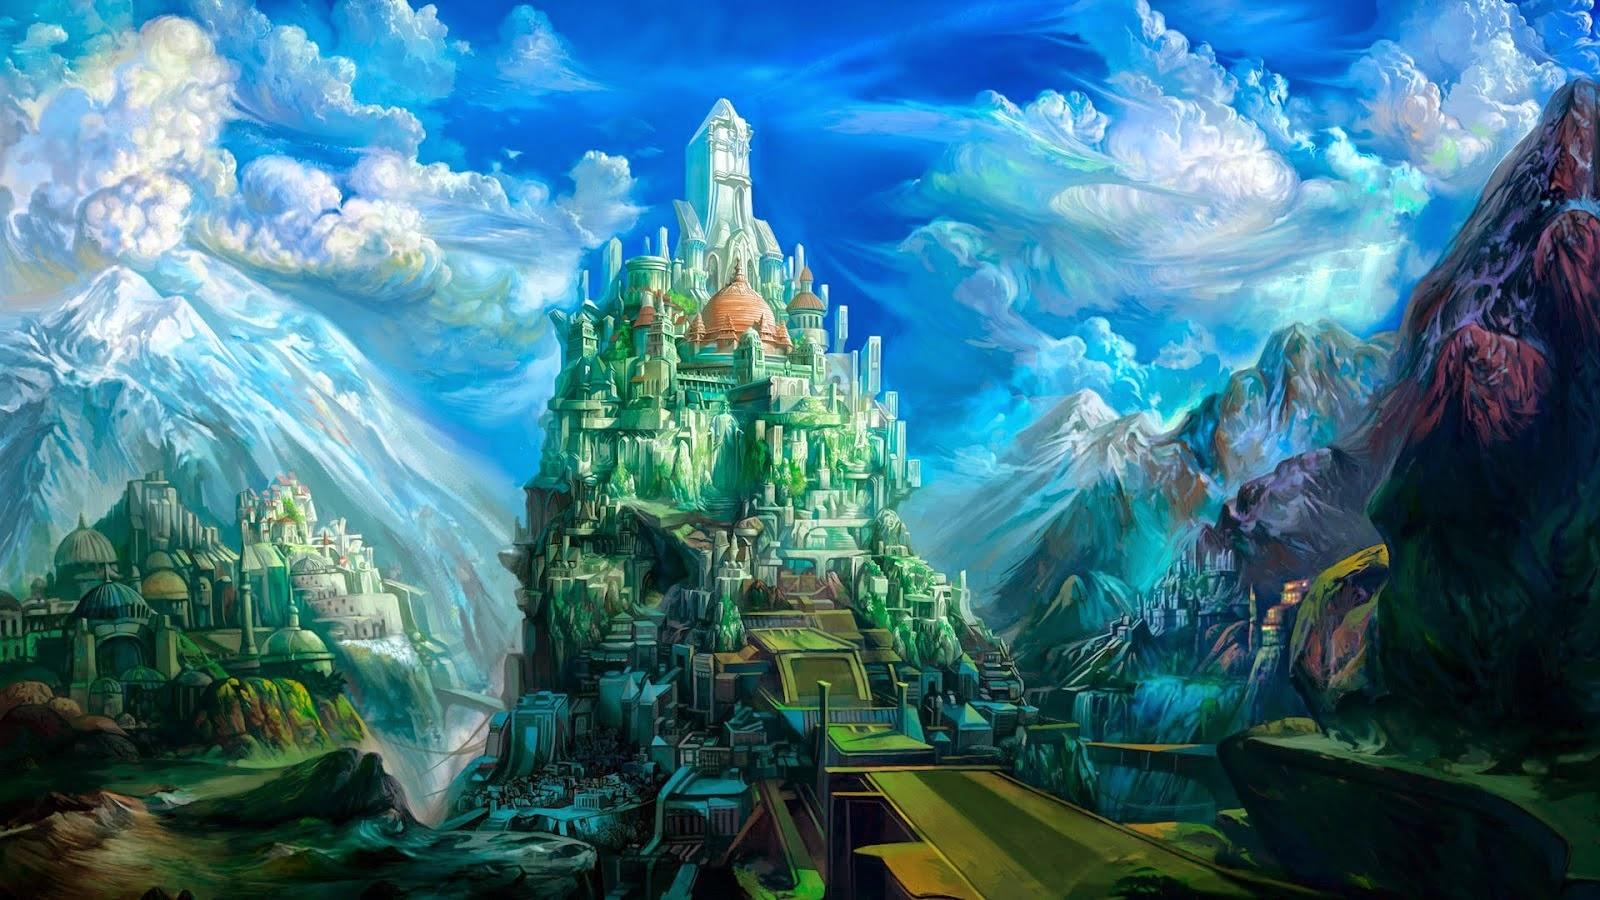 Water Wallpaper Hd Live Fantasie Huizen Op Rotsen Hd Wallpapers